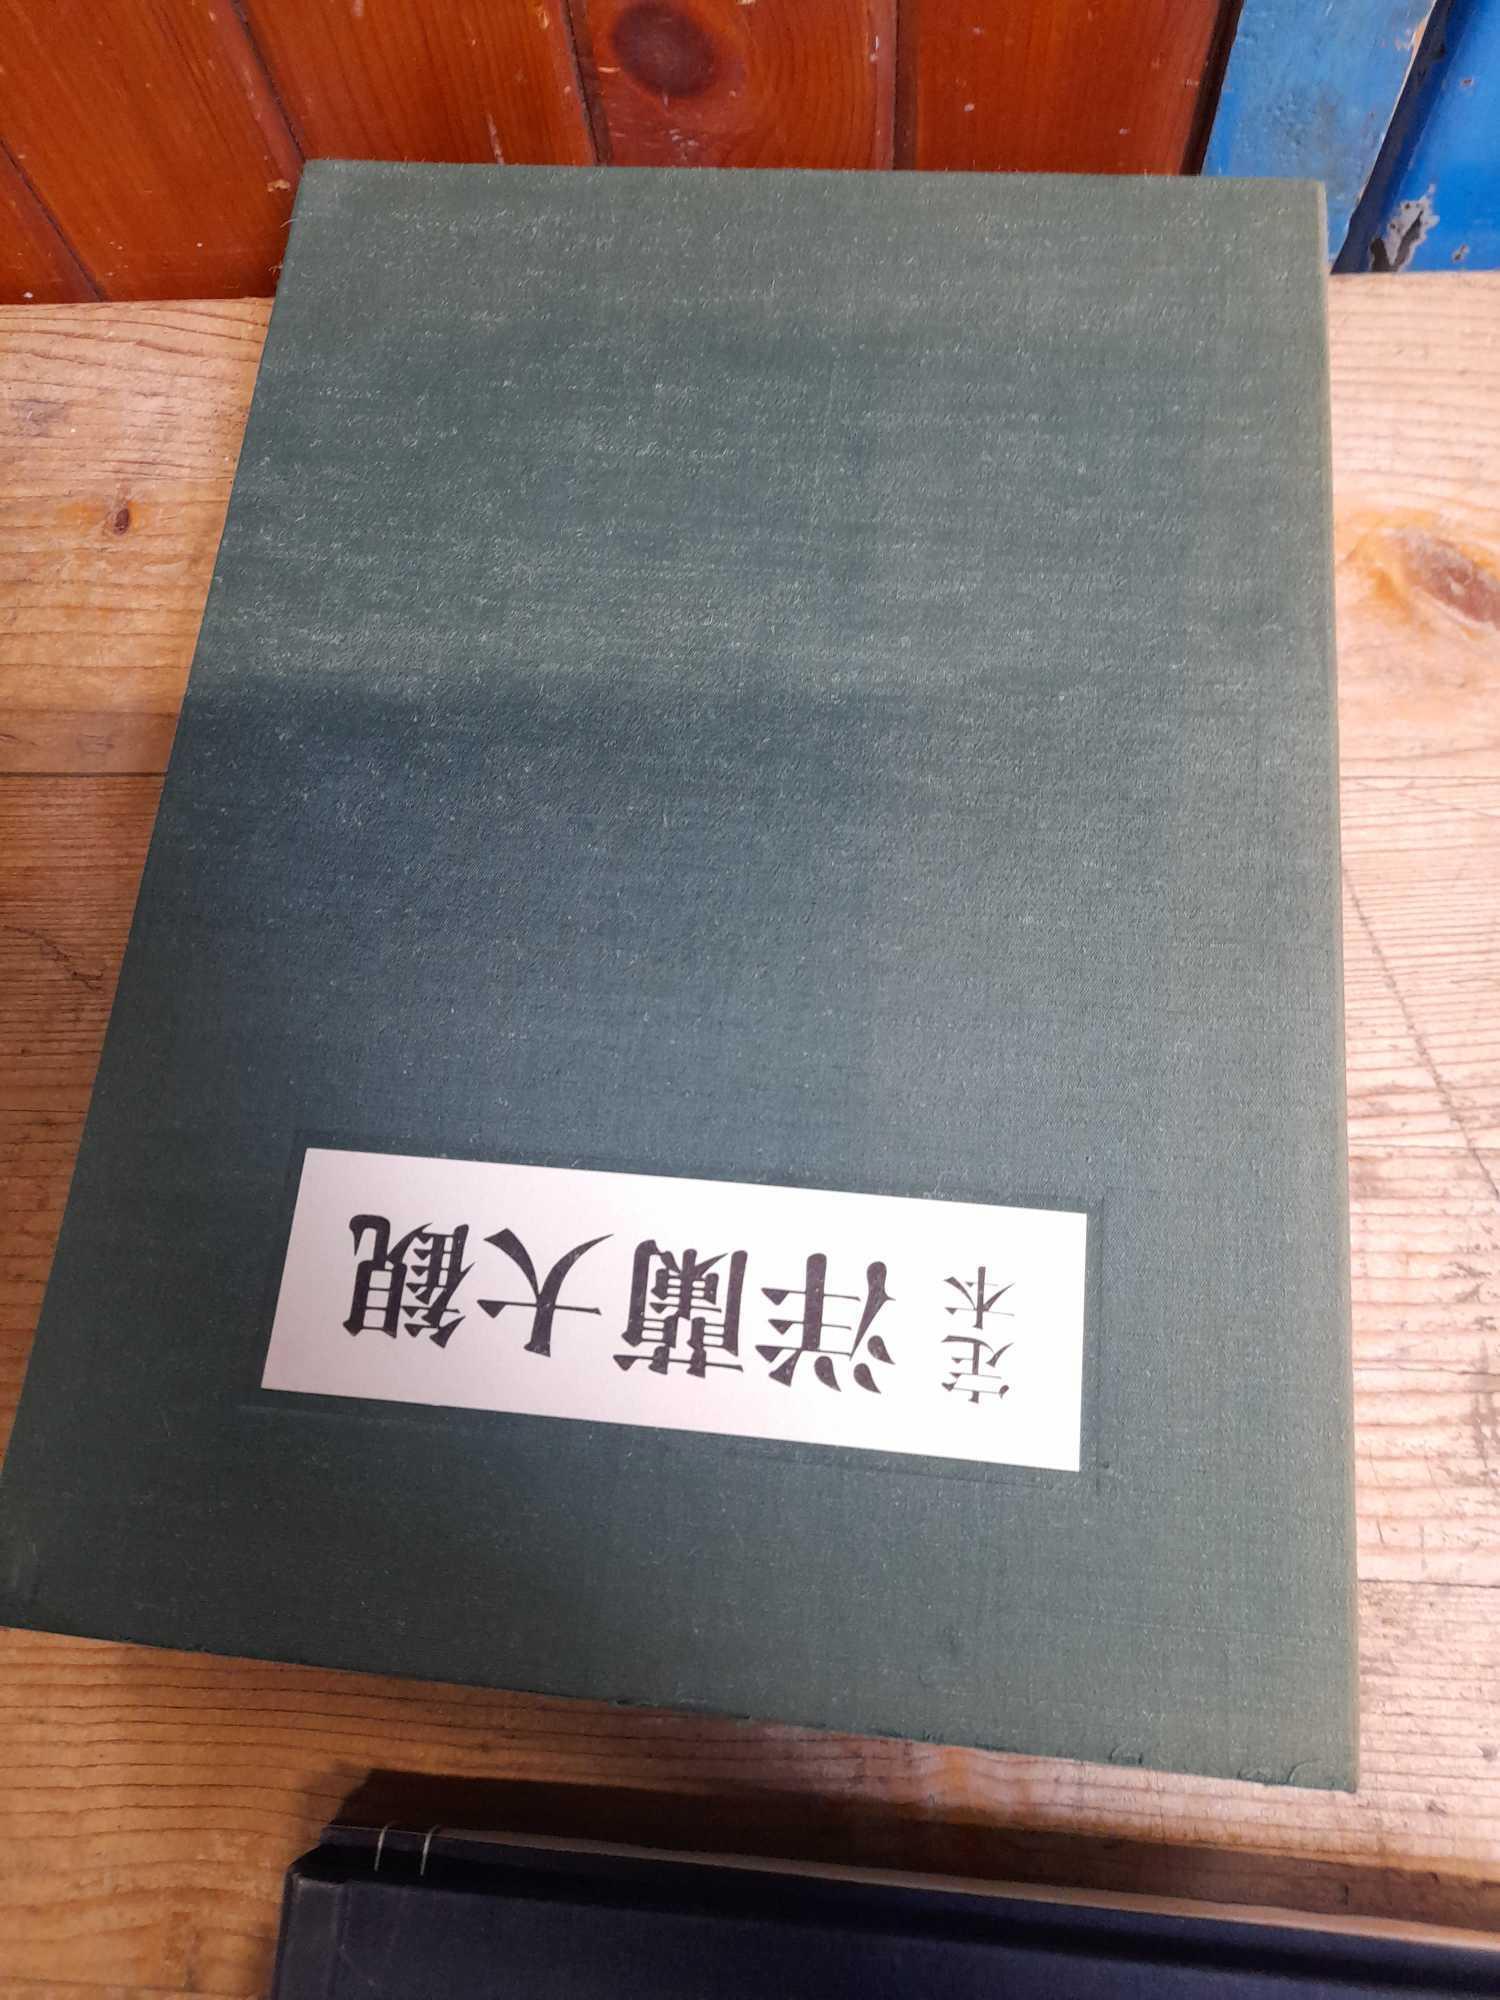 2 ORIENTAL BOOKS - Image 8 of 14